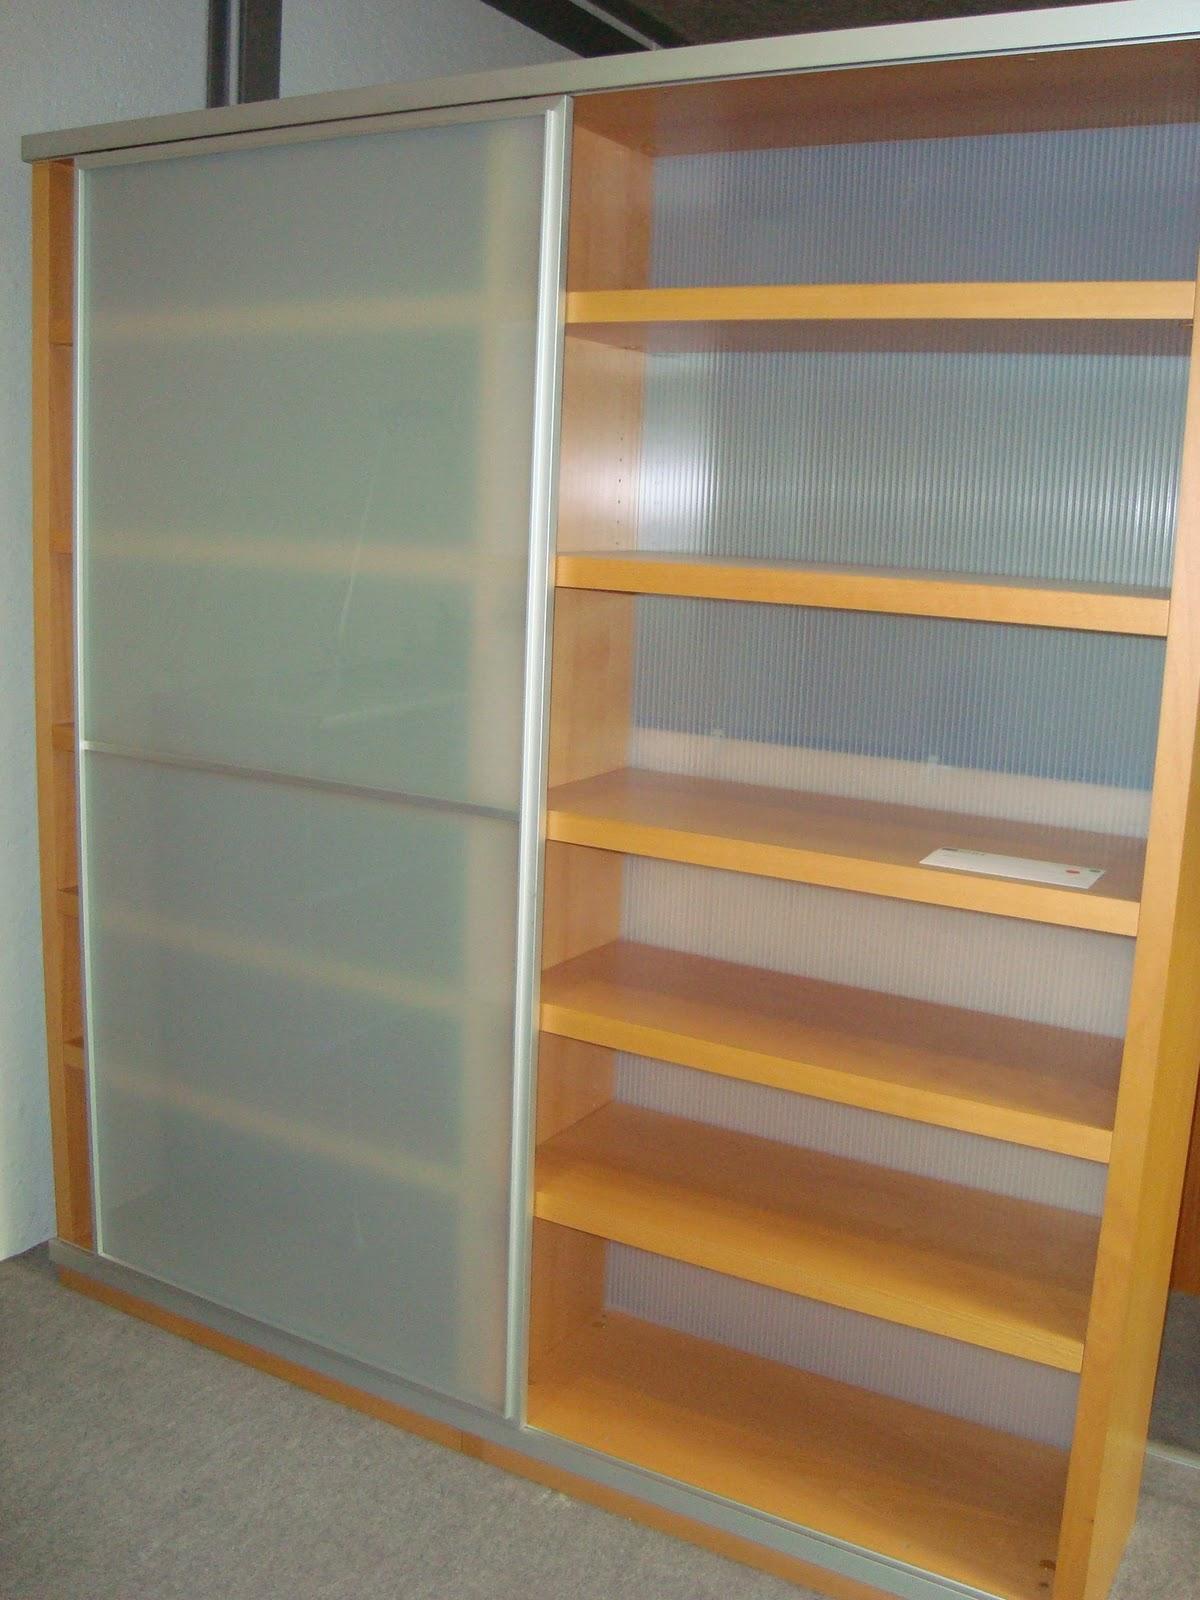 Liquidacion muebles de dise o estanterias librerias Estanterias de diseno